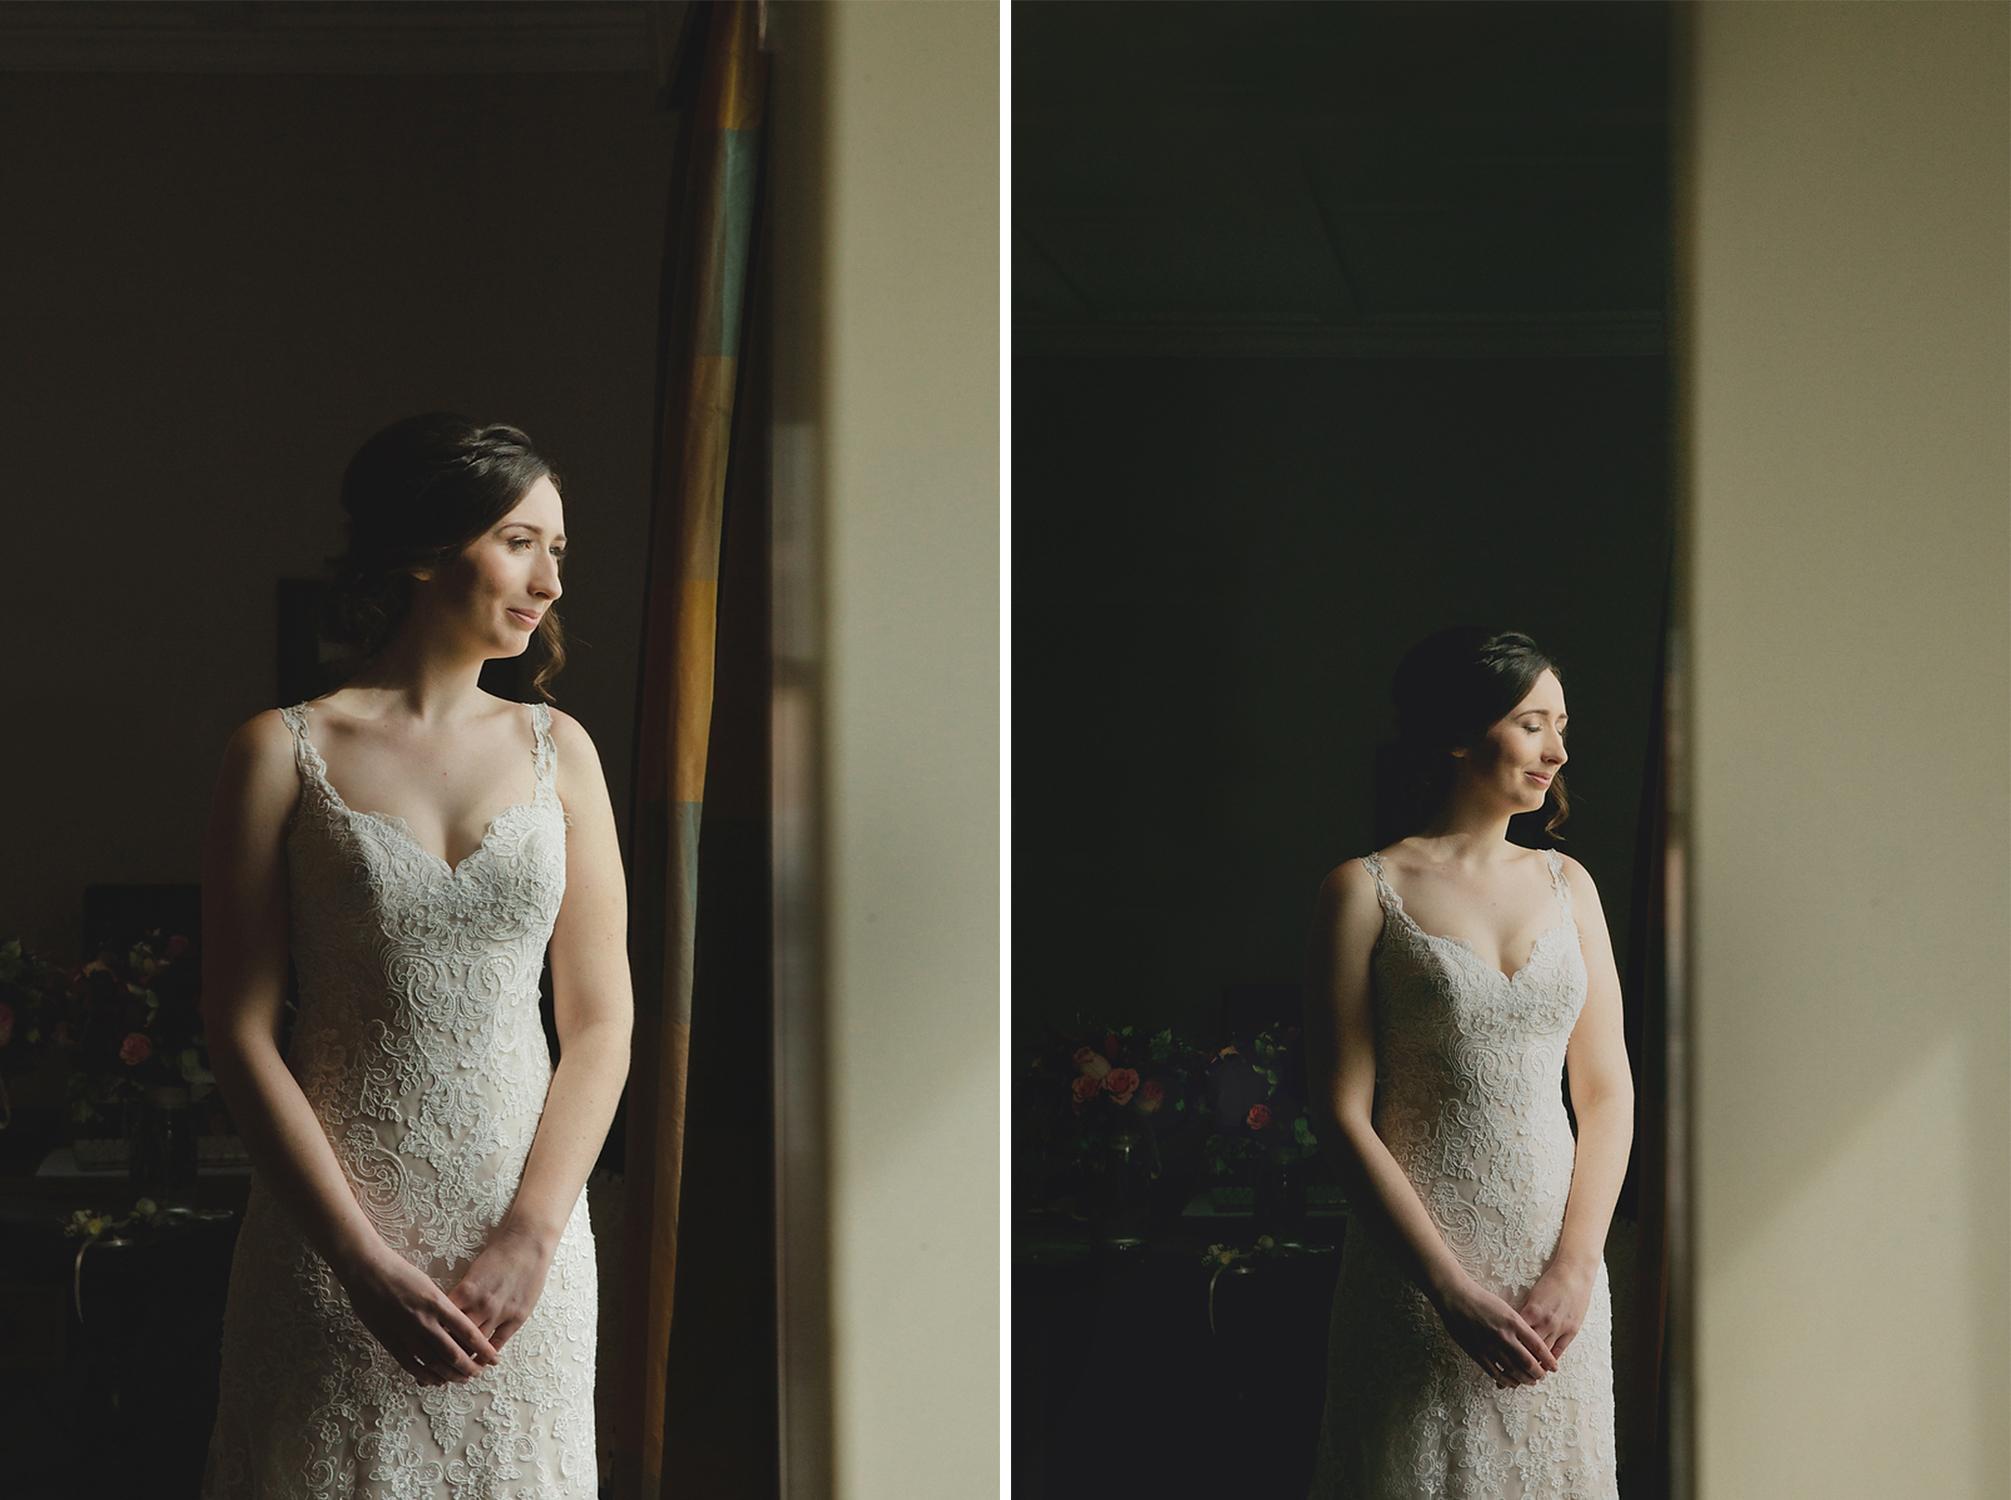 wellington wedding photography NZ - 0075.JPG